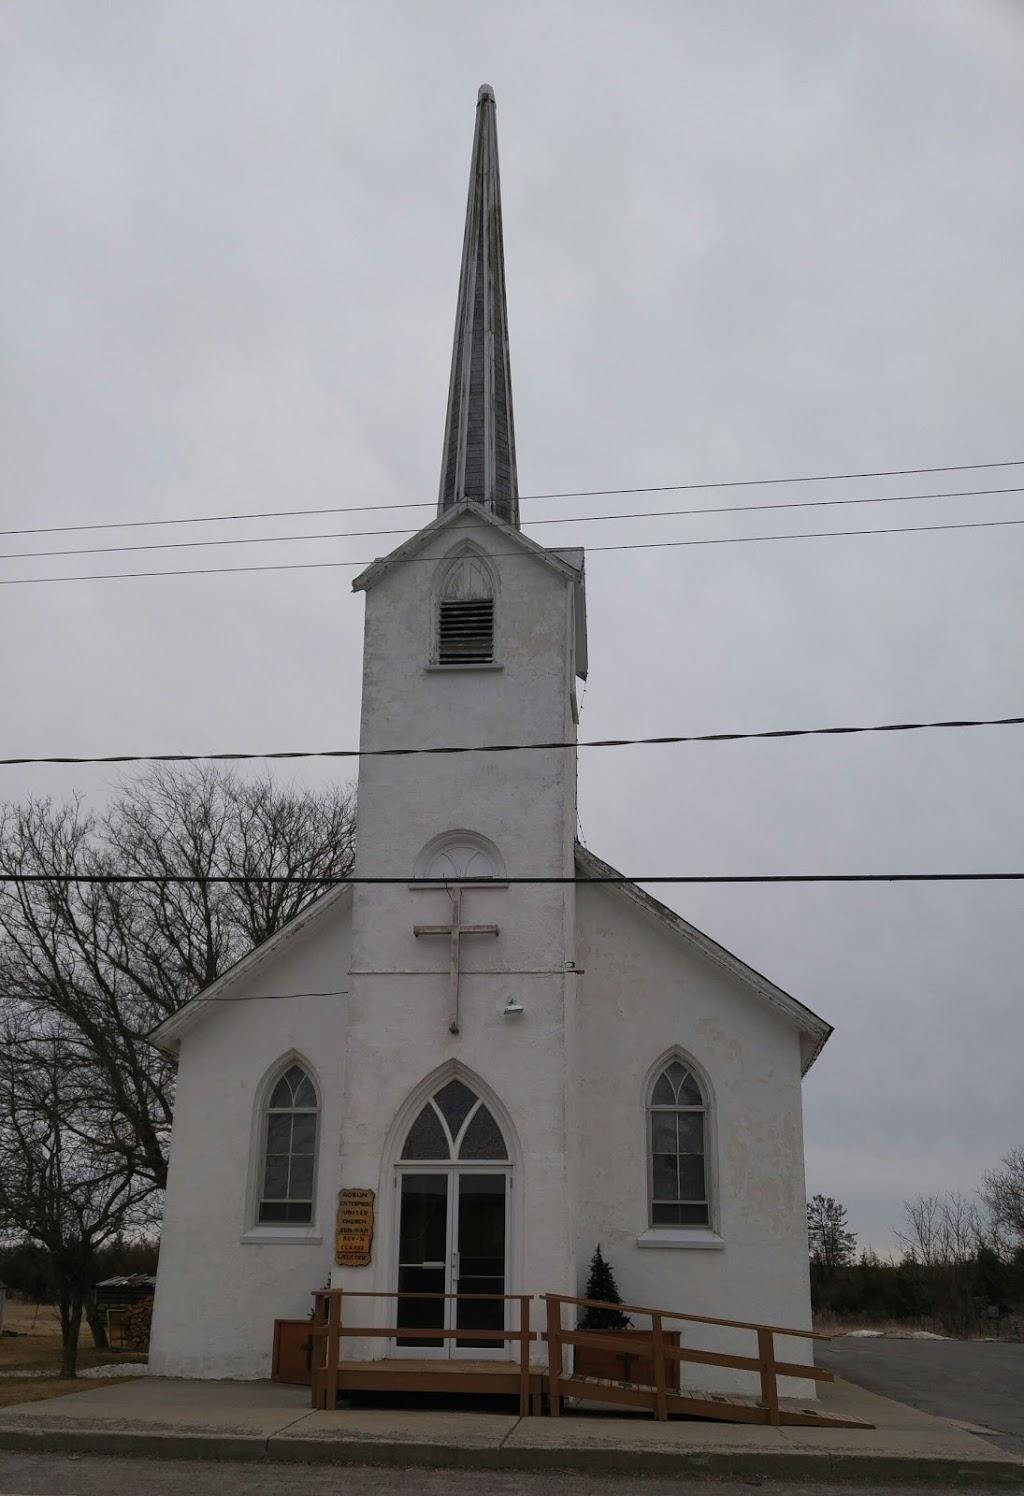 Roblin Entreprise United Church | church | 3271 Lennox and Addington County Rd 41, Roblin, ON K0K 2W0, Canada